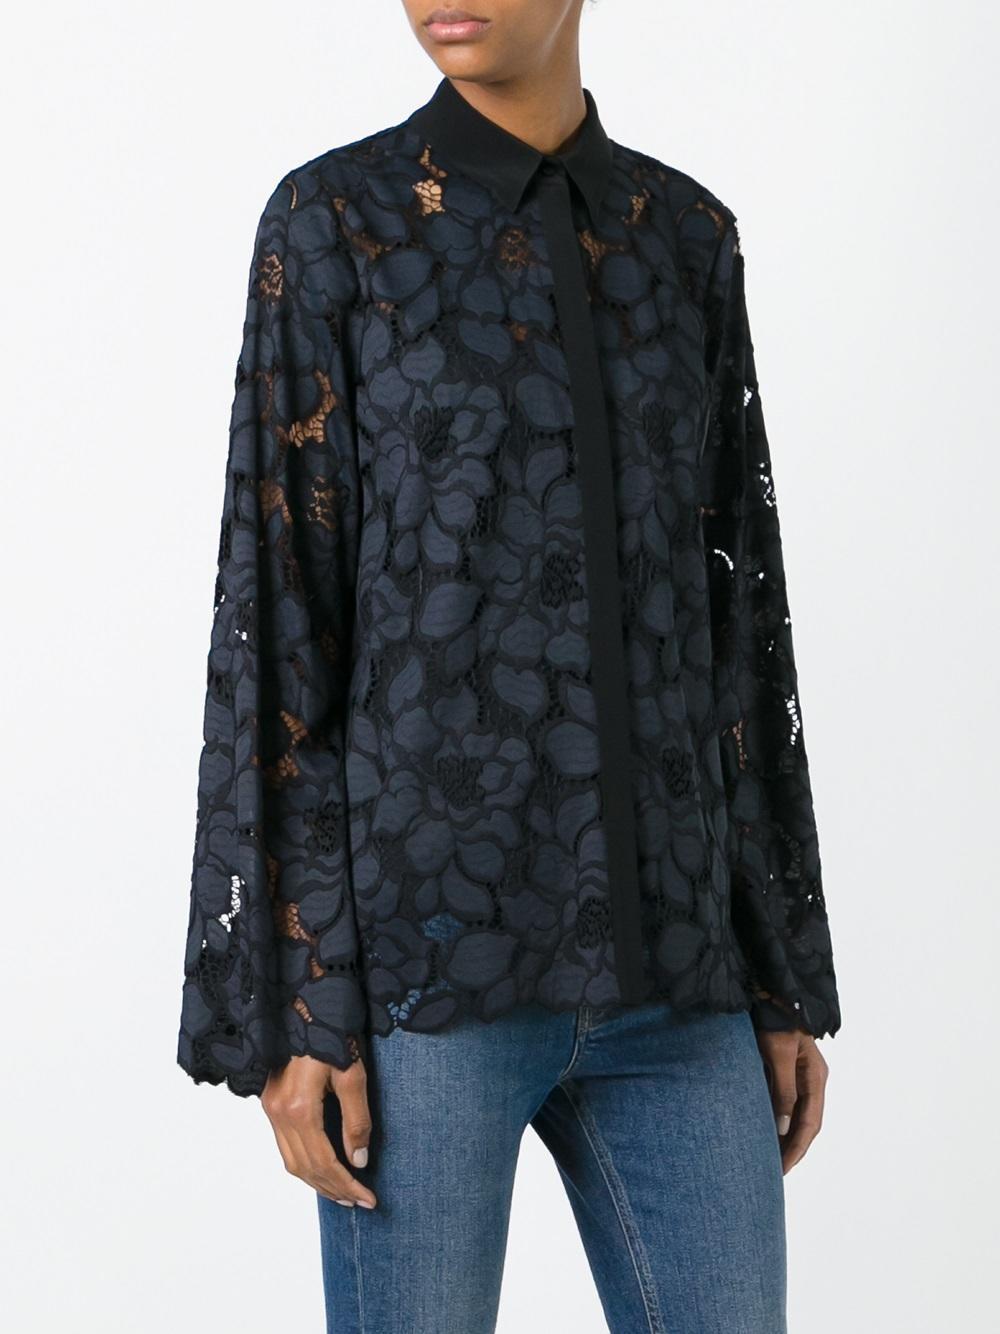 lyst dorothee schumacher laced shirt in blue. Black Bedroom Furniture Sets. Home Design Ideas